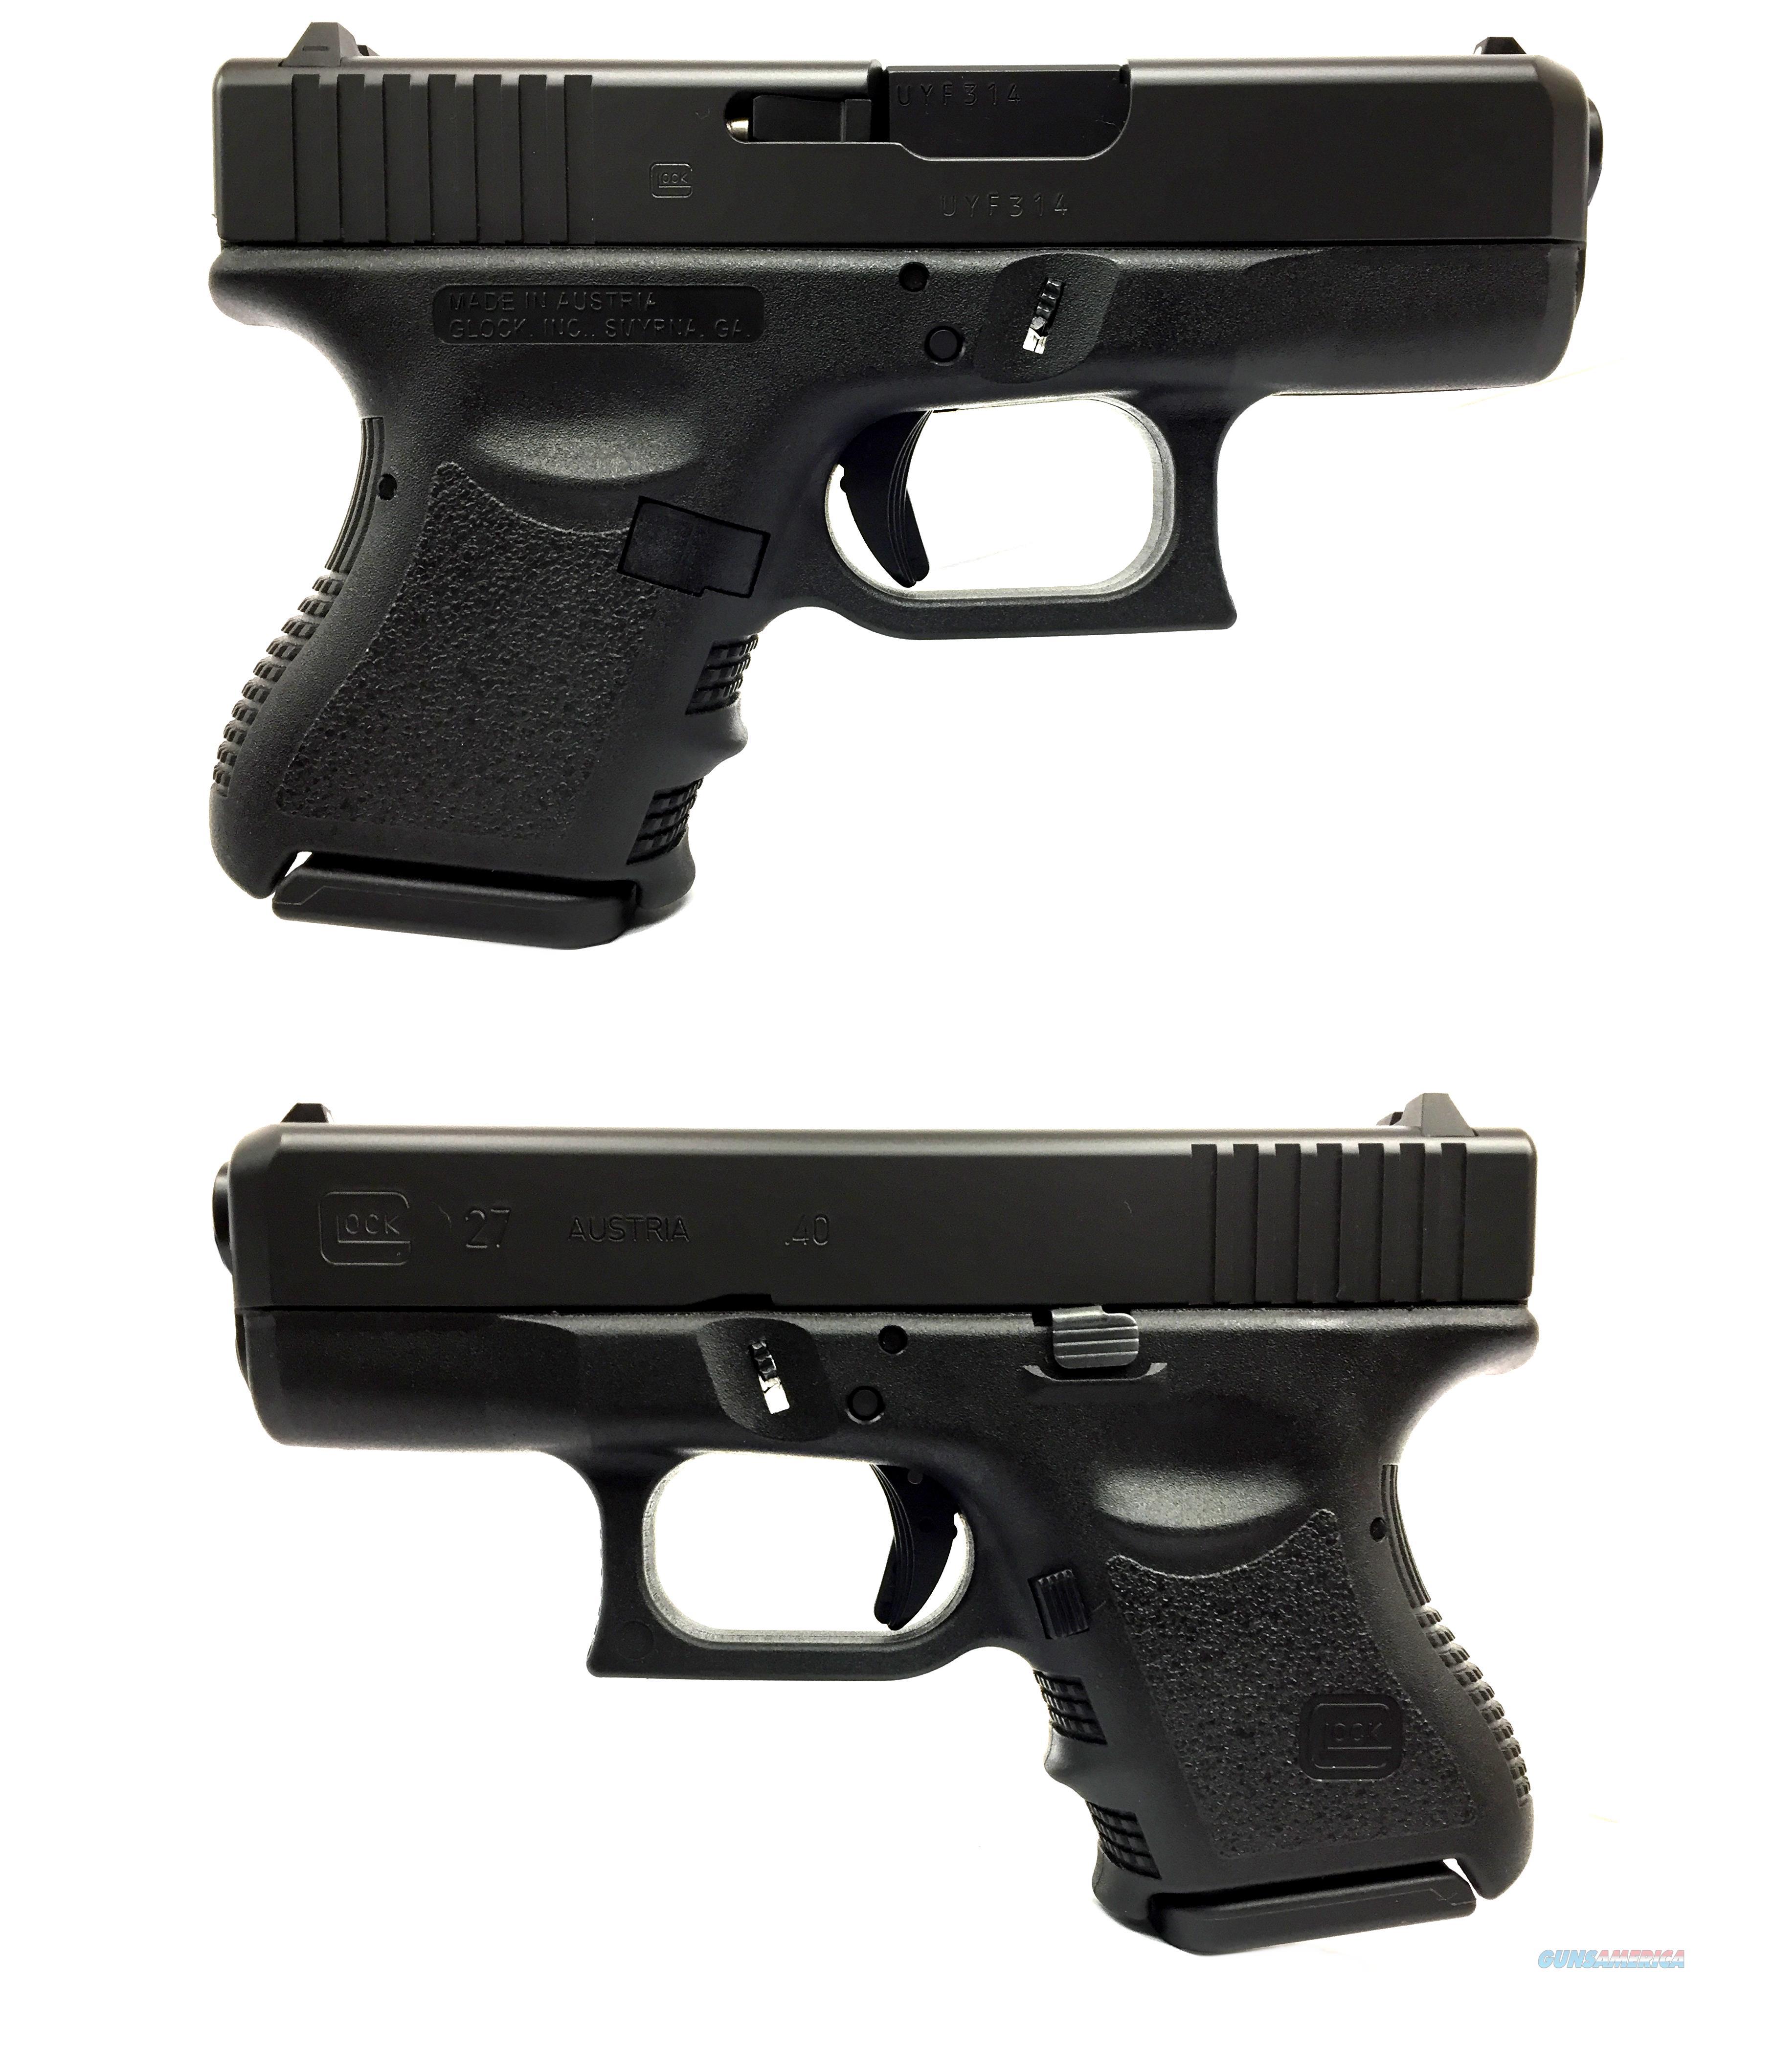 Glock 27 Subcompact .40S&W Pistol  Guns > Pistols > Glock Pistols > 26/27